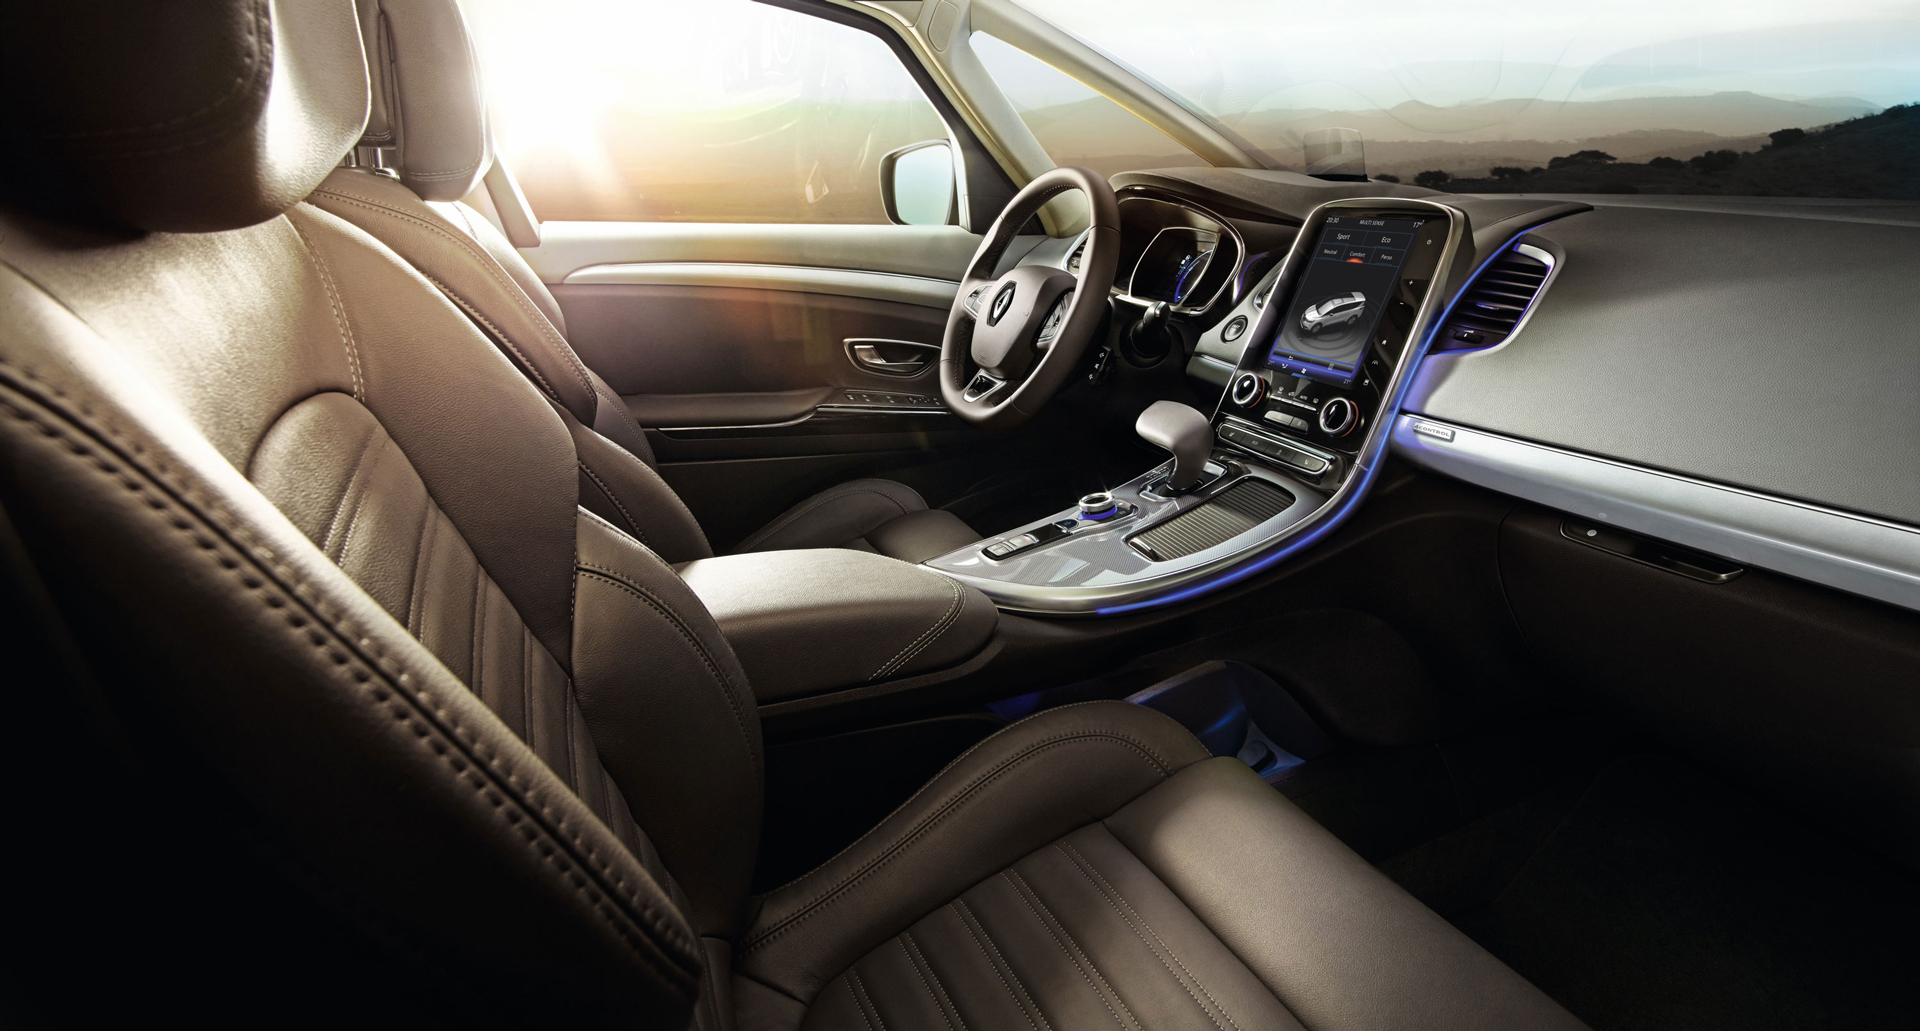 2015 Renault Espace - interior design / design intérieur